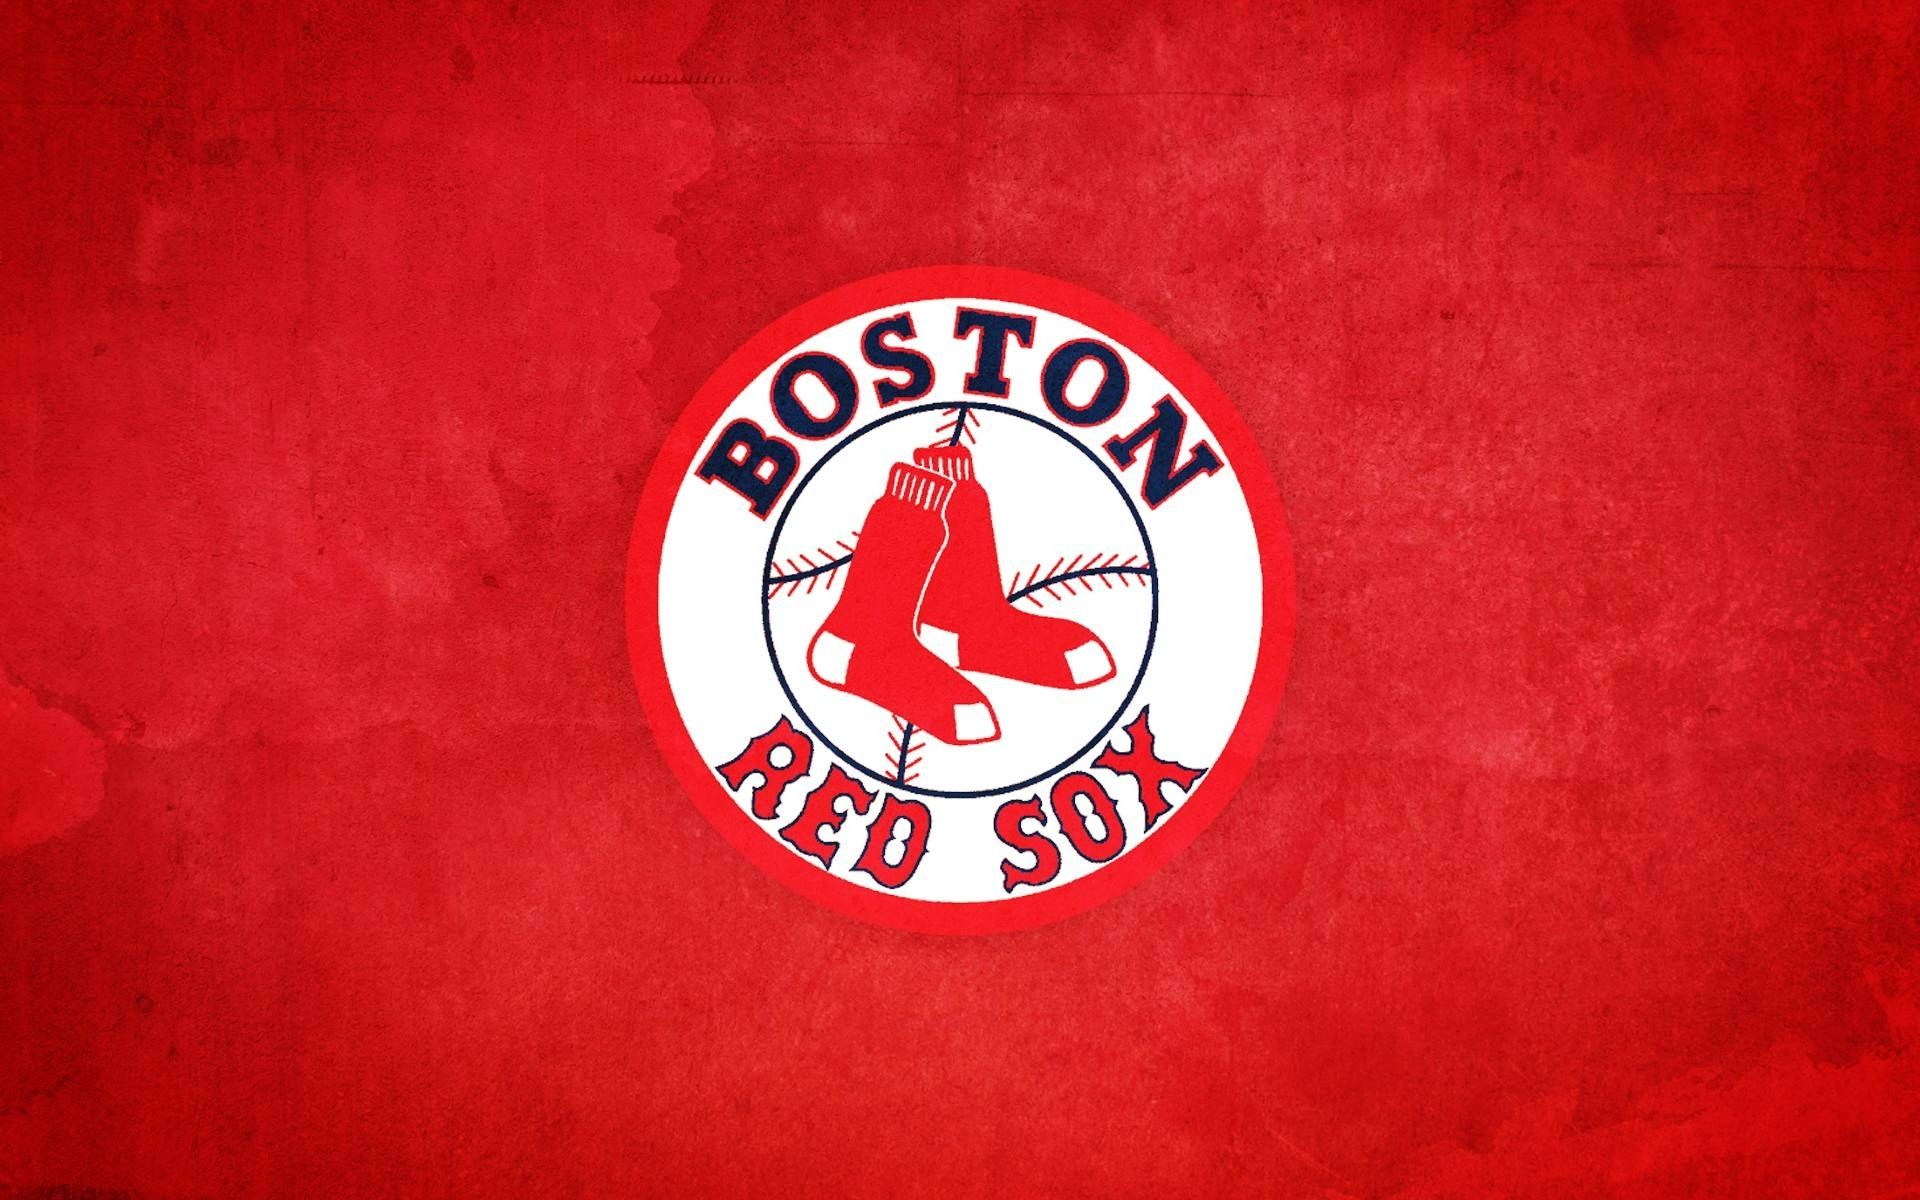 94815d1444797693t Iphone 6 6 Plus 6s 6s Plus 7 7 Plus 8 8 Plus Sports Wallpaper Request Thread 6 Boston Red Sox Wallpaper Red Sox Wallpaper Boston Red Sox Logo